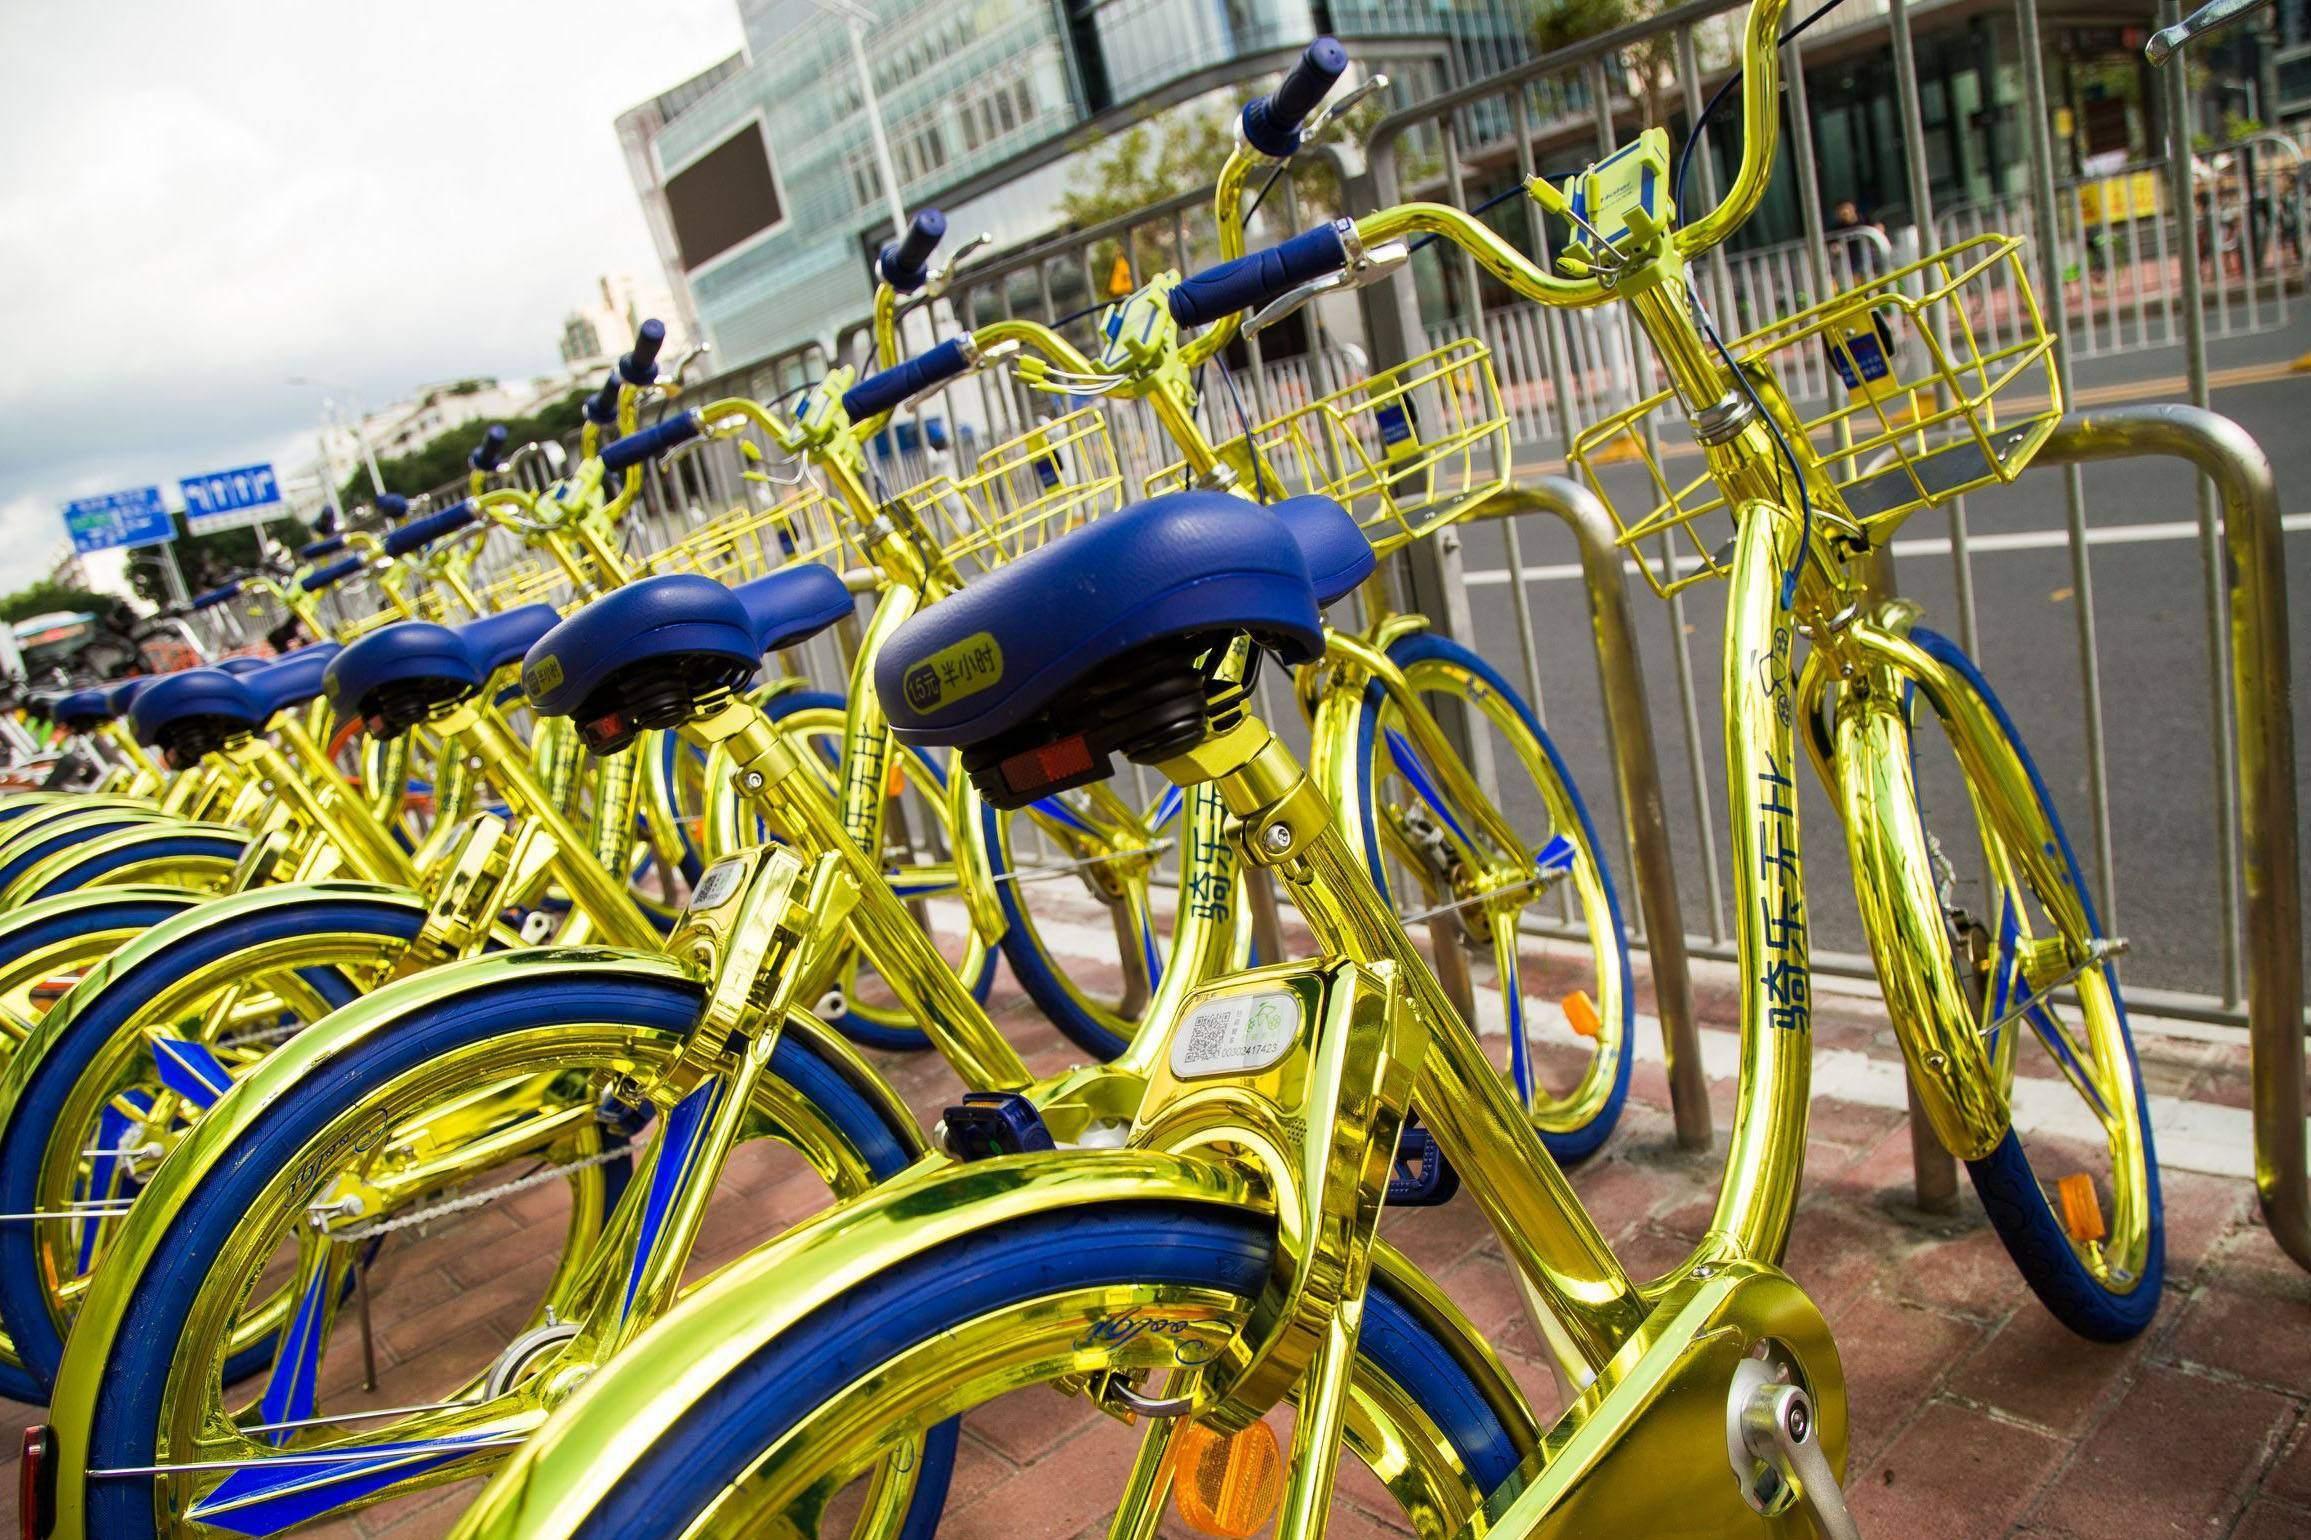 Coolqi bikes